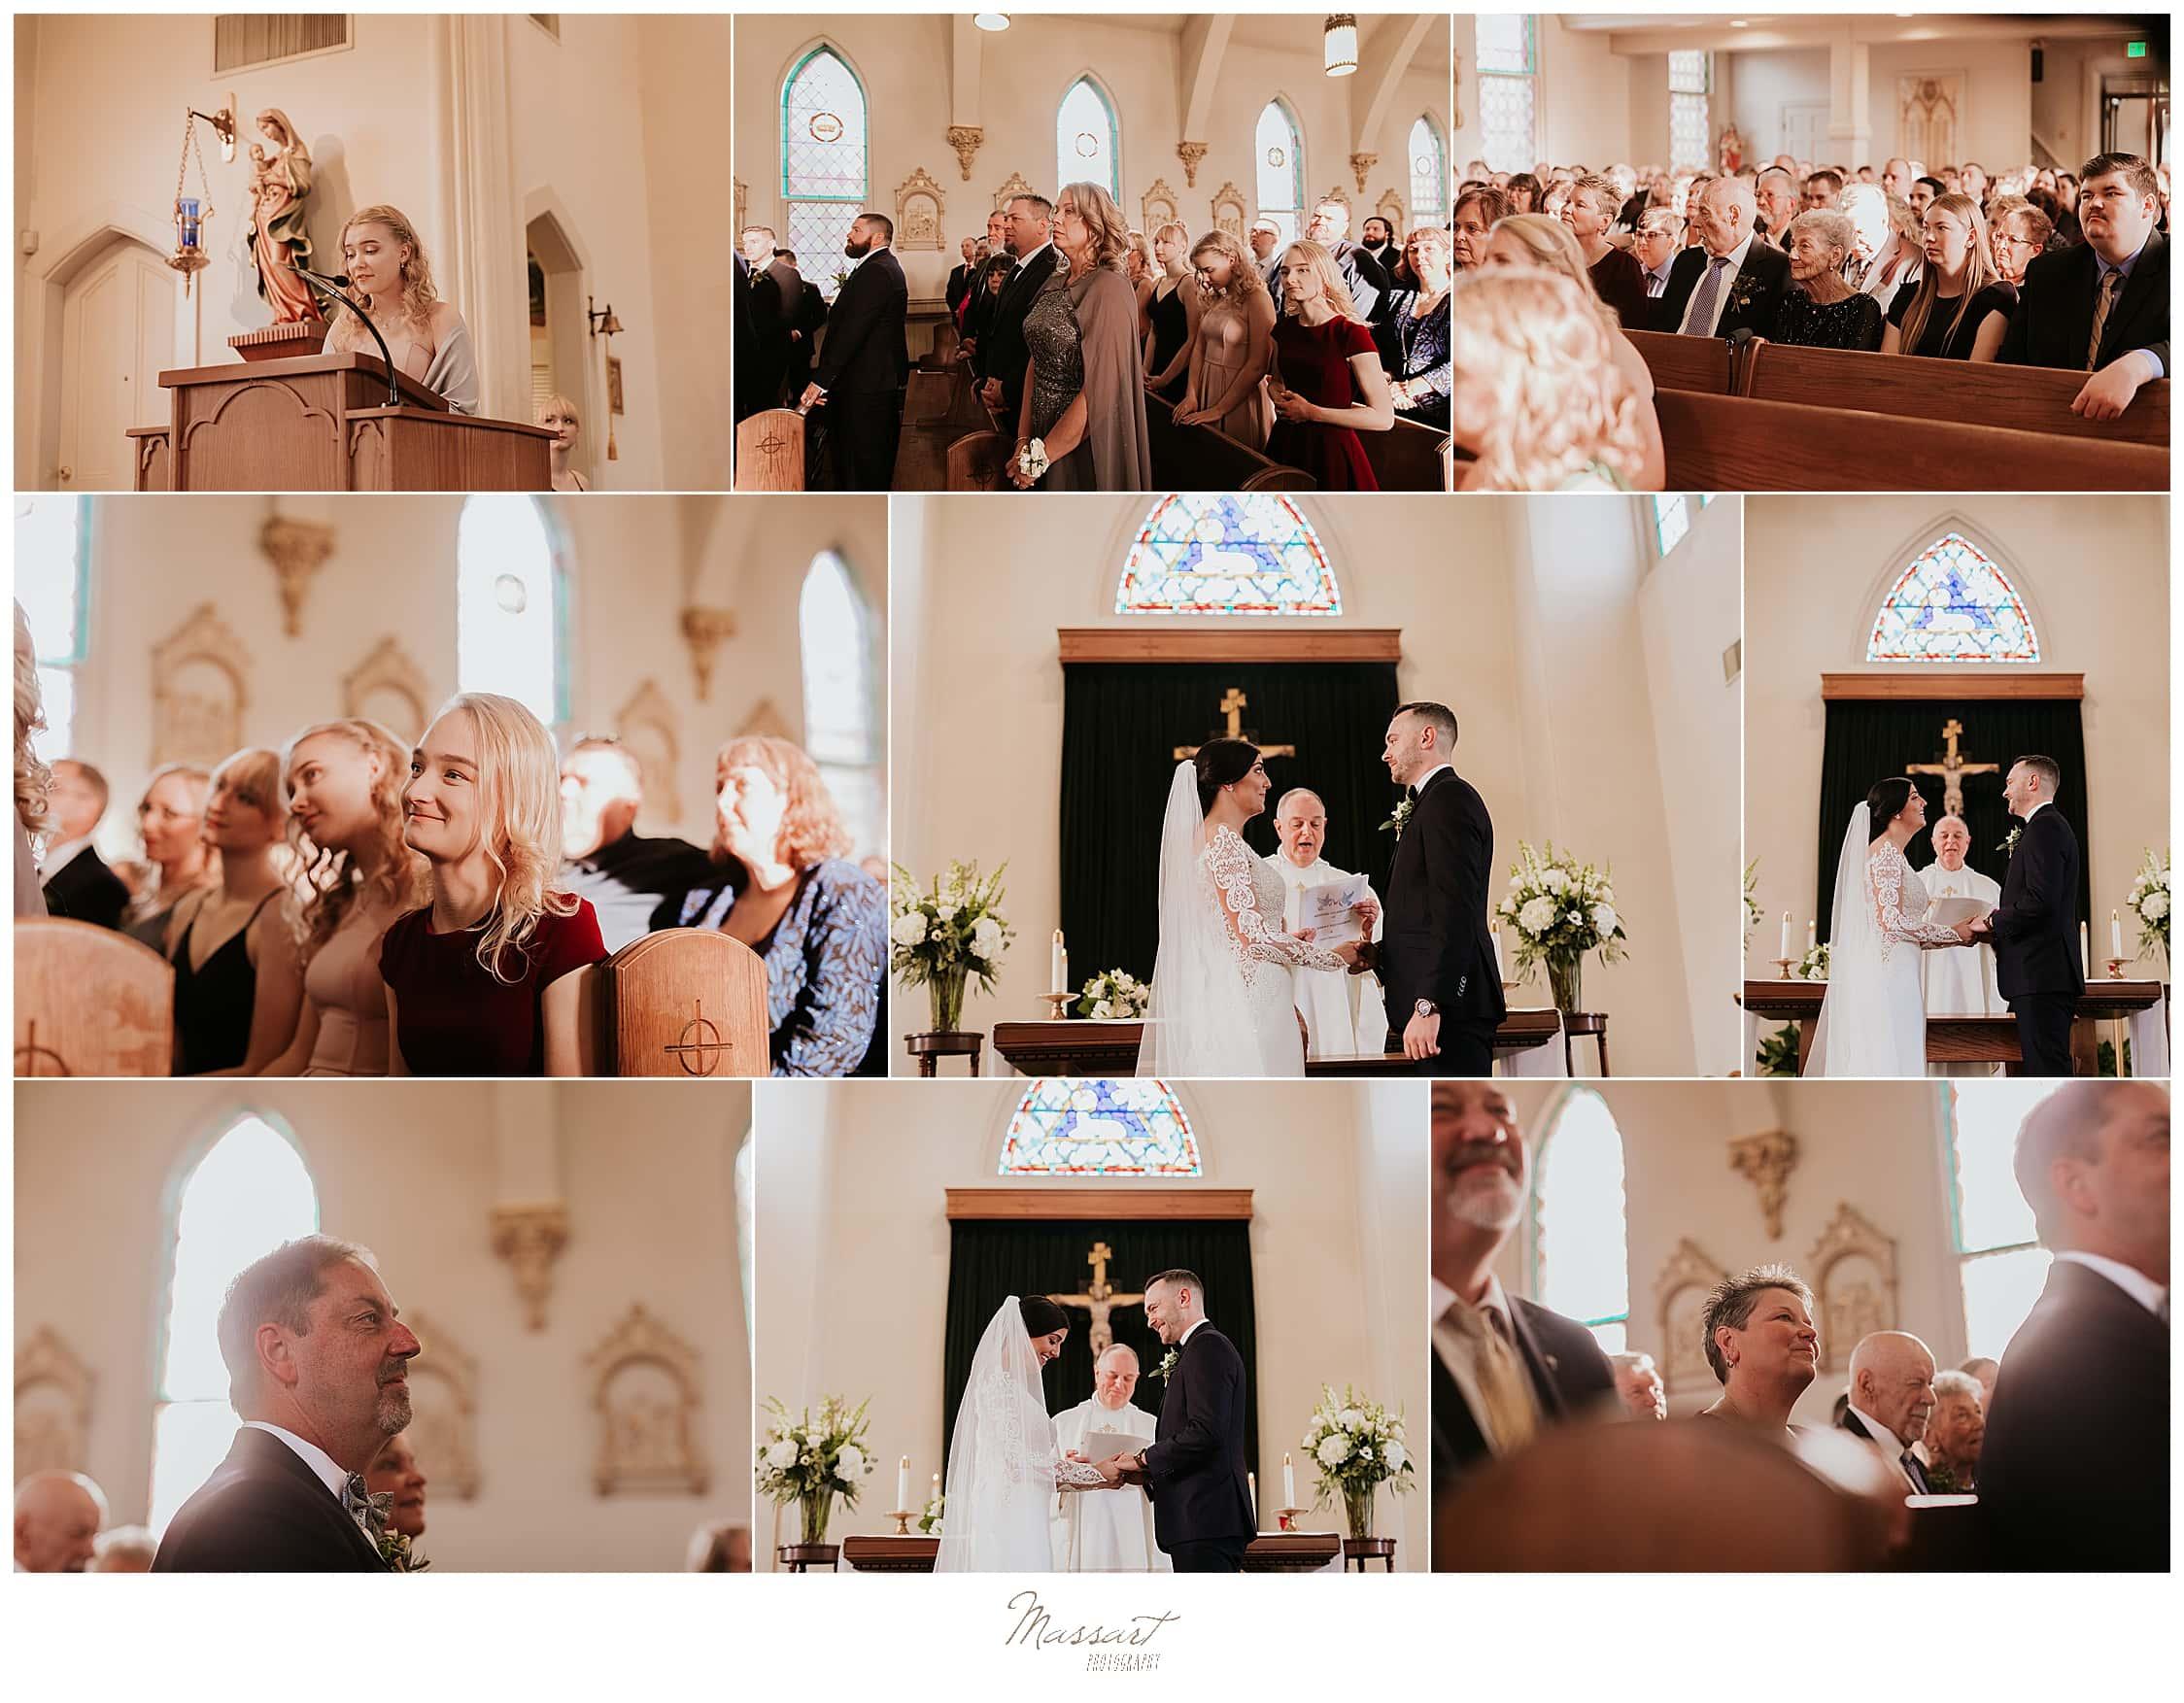 church ceremony photographed by Foxboro MA wedding photographers Massart Photography